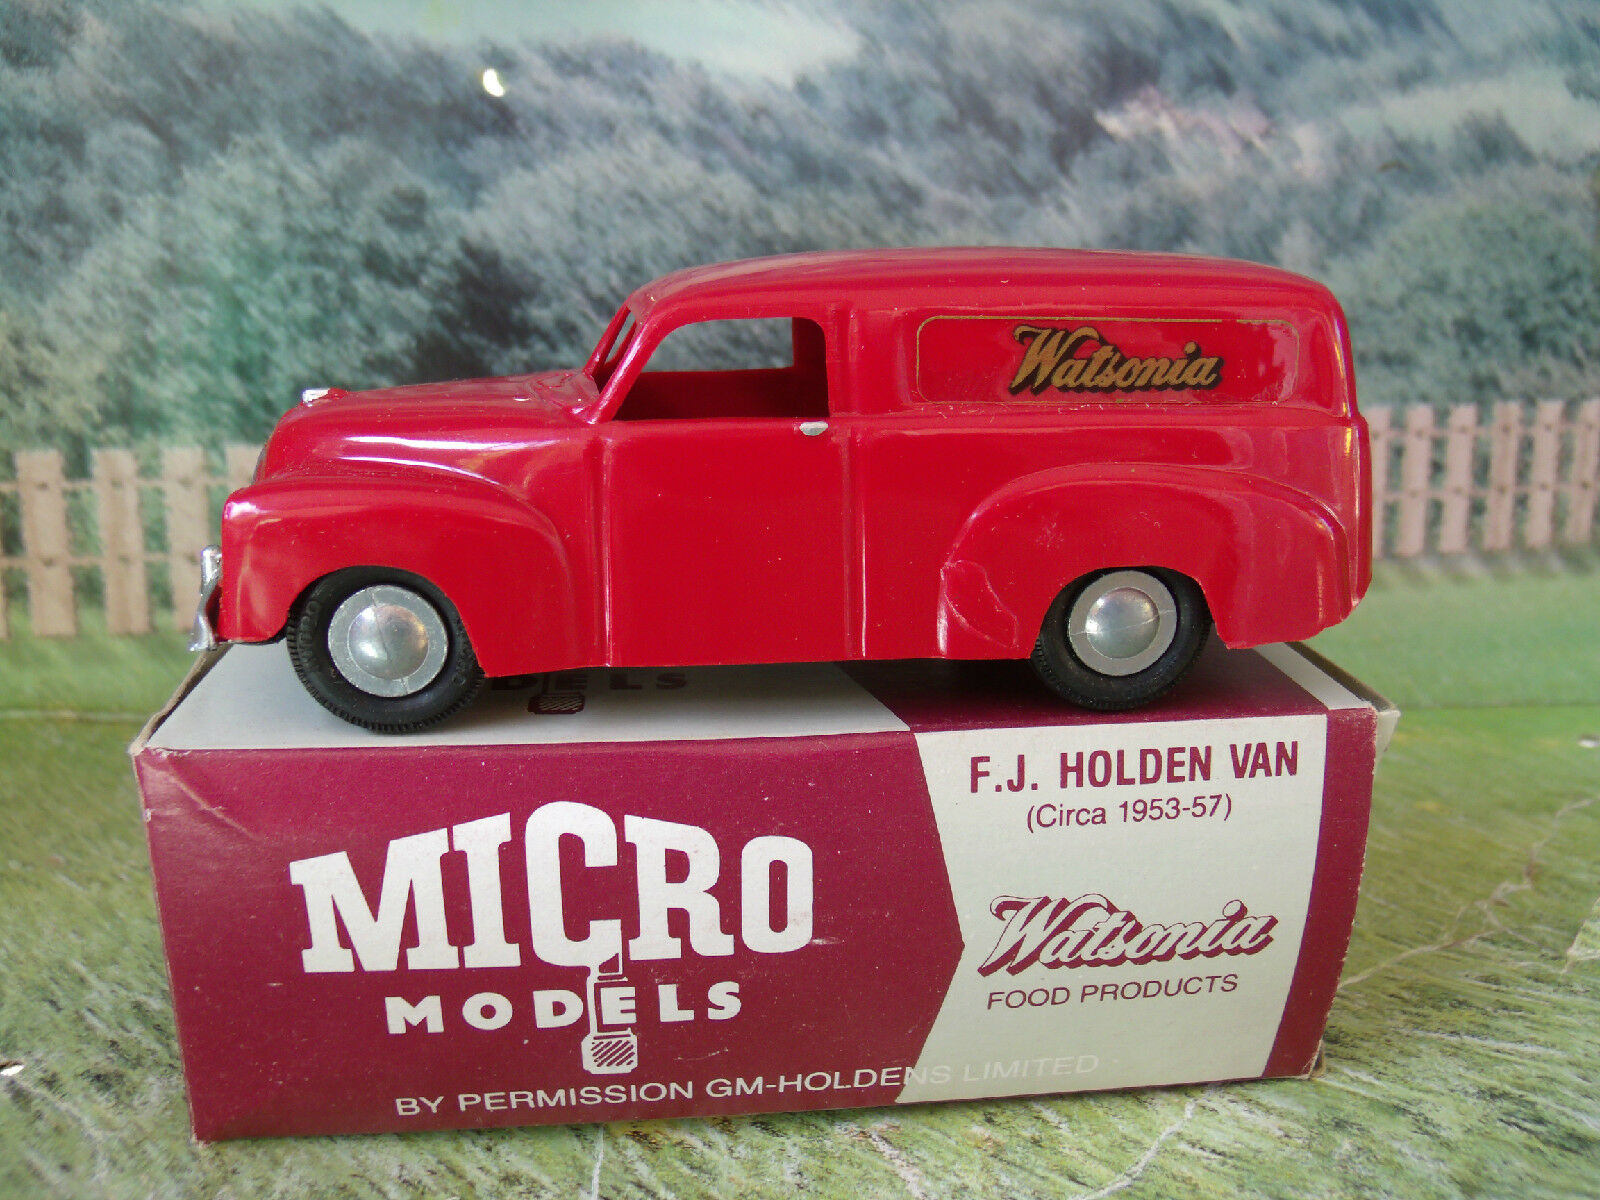 Mikro - modelle (australien)   wa-1 gm f.j. holden van